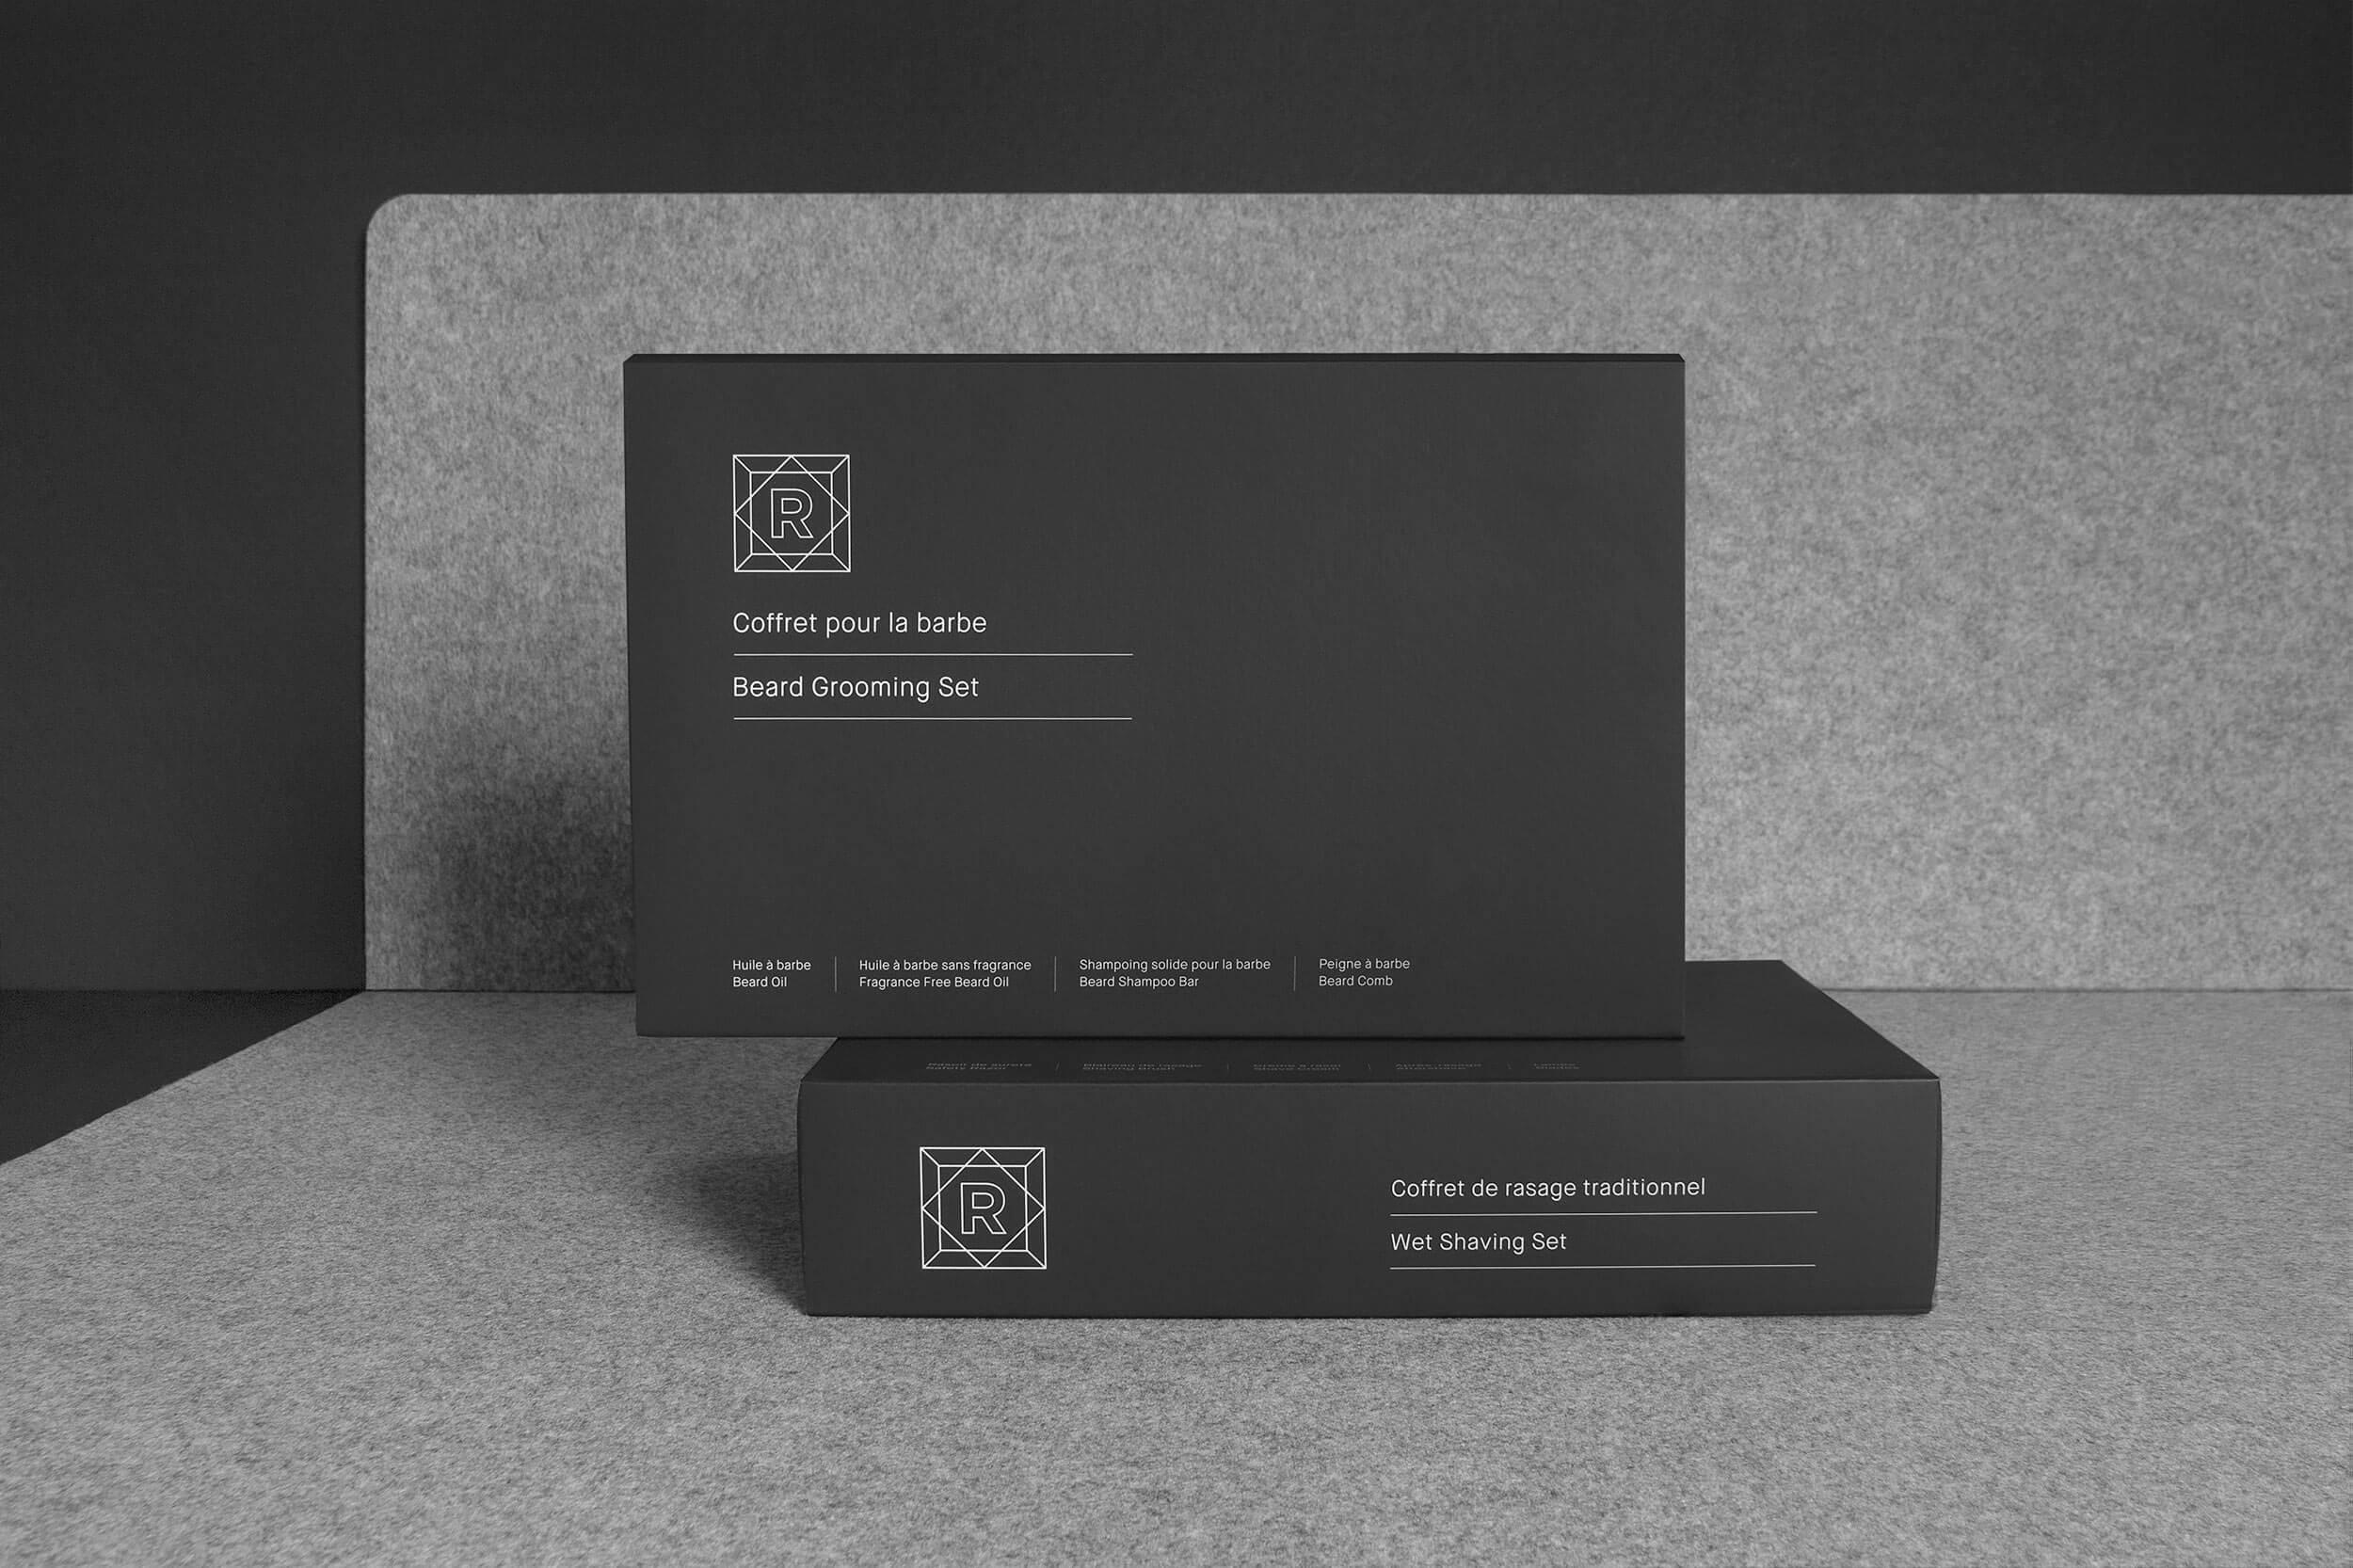 Figure-Jeremy-Hall-Design-Graphique-Logo-Branding-Image-De-Marque-Quebec-Rituels-Emballage-Packaging-Cosmetiques-Rasage